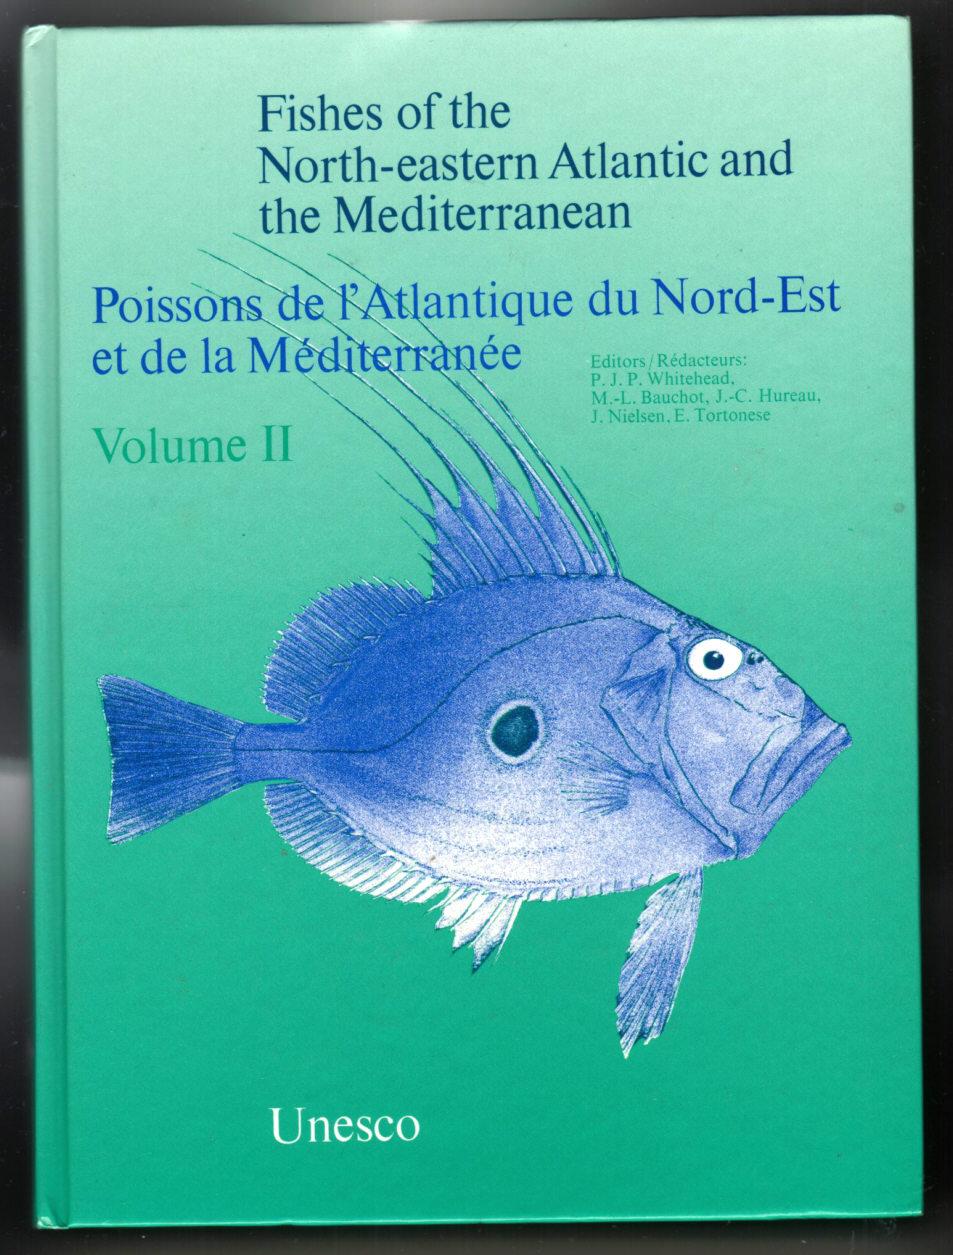 Mediterranean books poissons de latlantique du nord est et de la mediterranee sciox Gallery